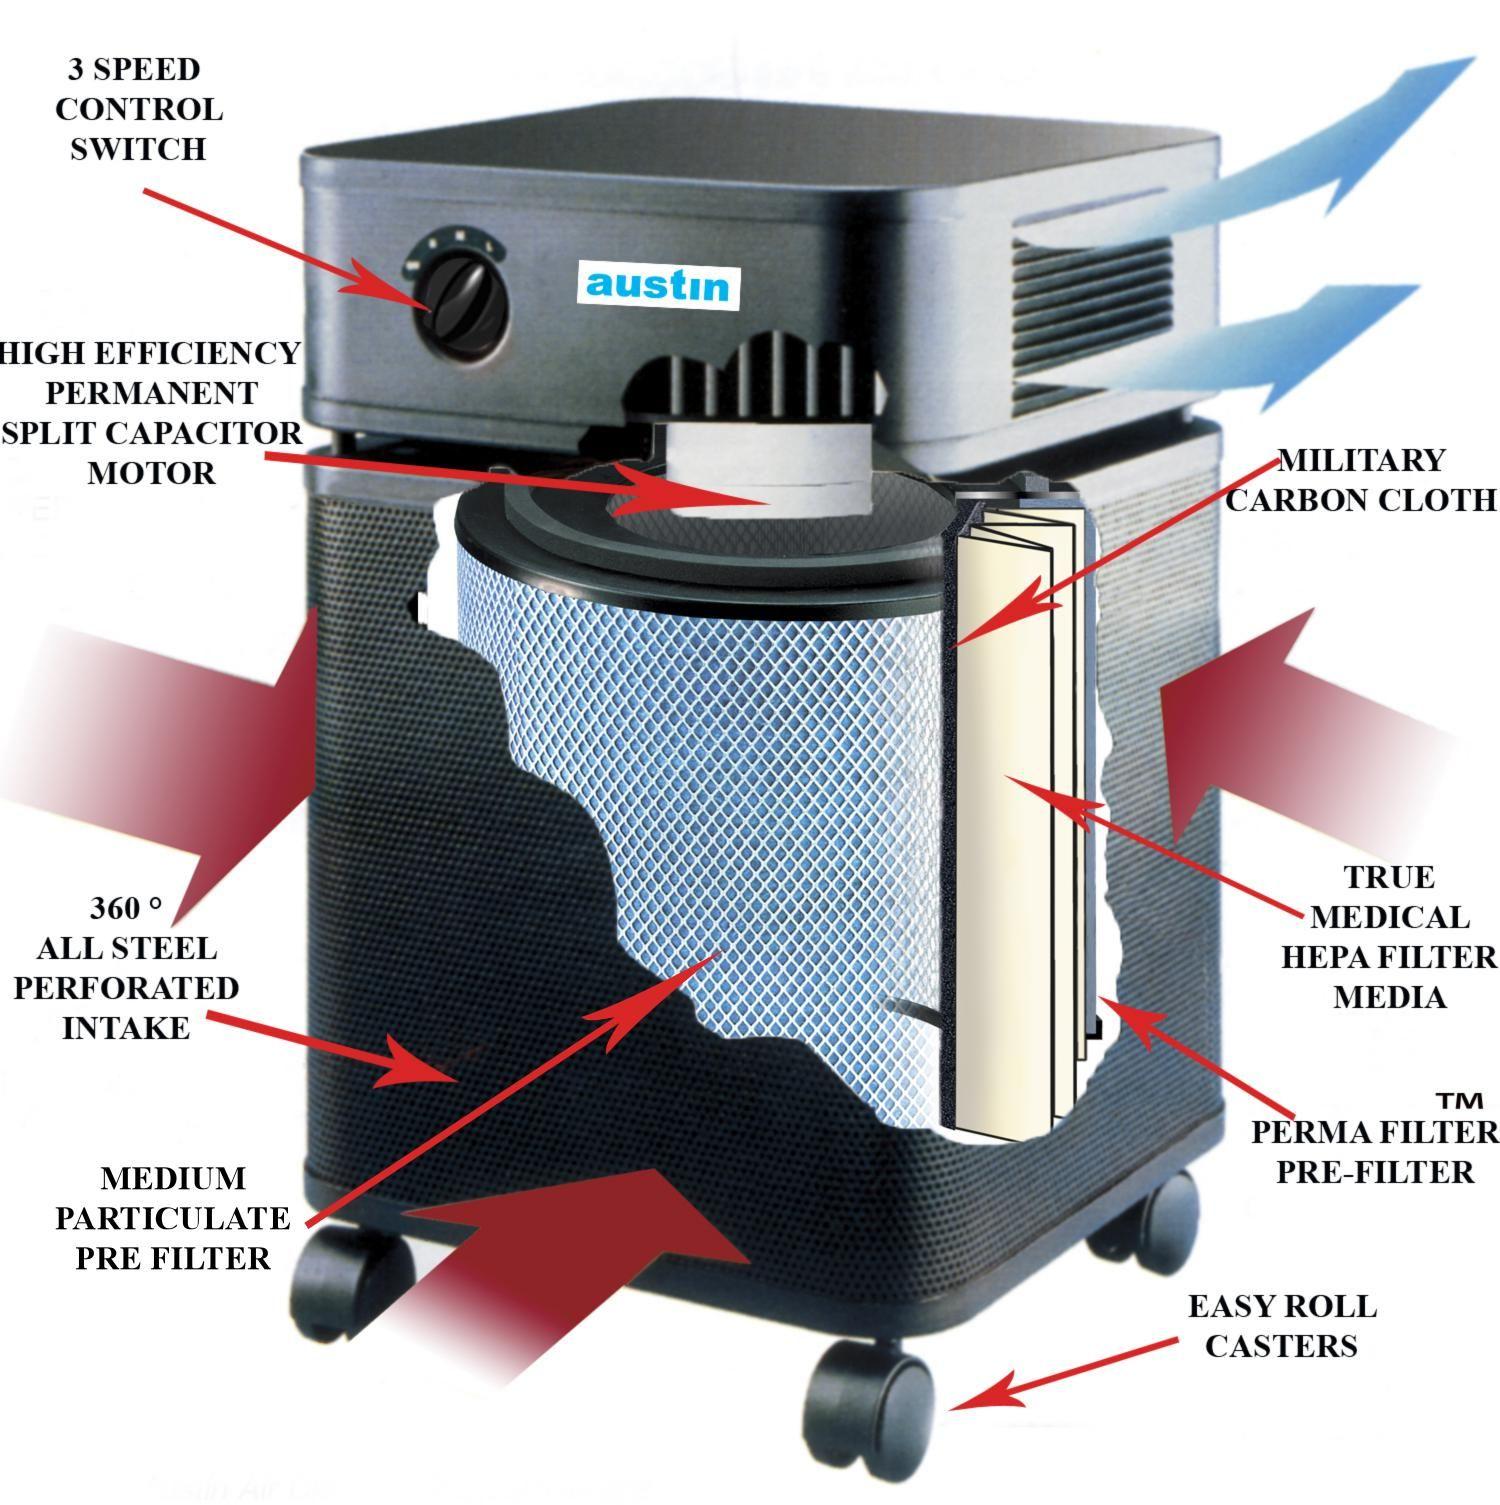 Allergy Machine (With images) Austin air purifier, Air